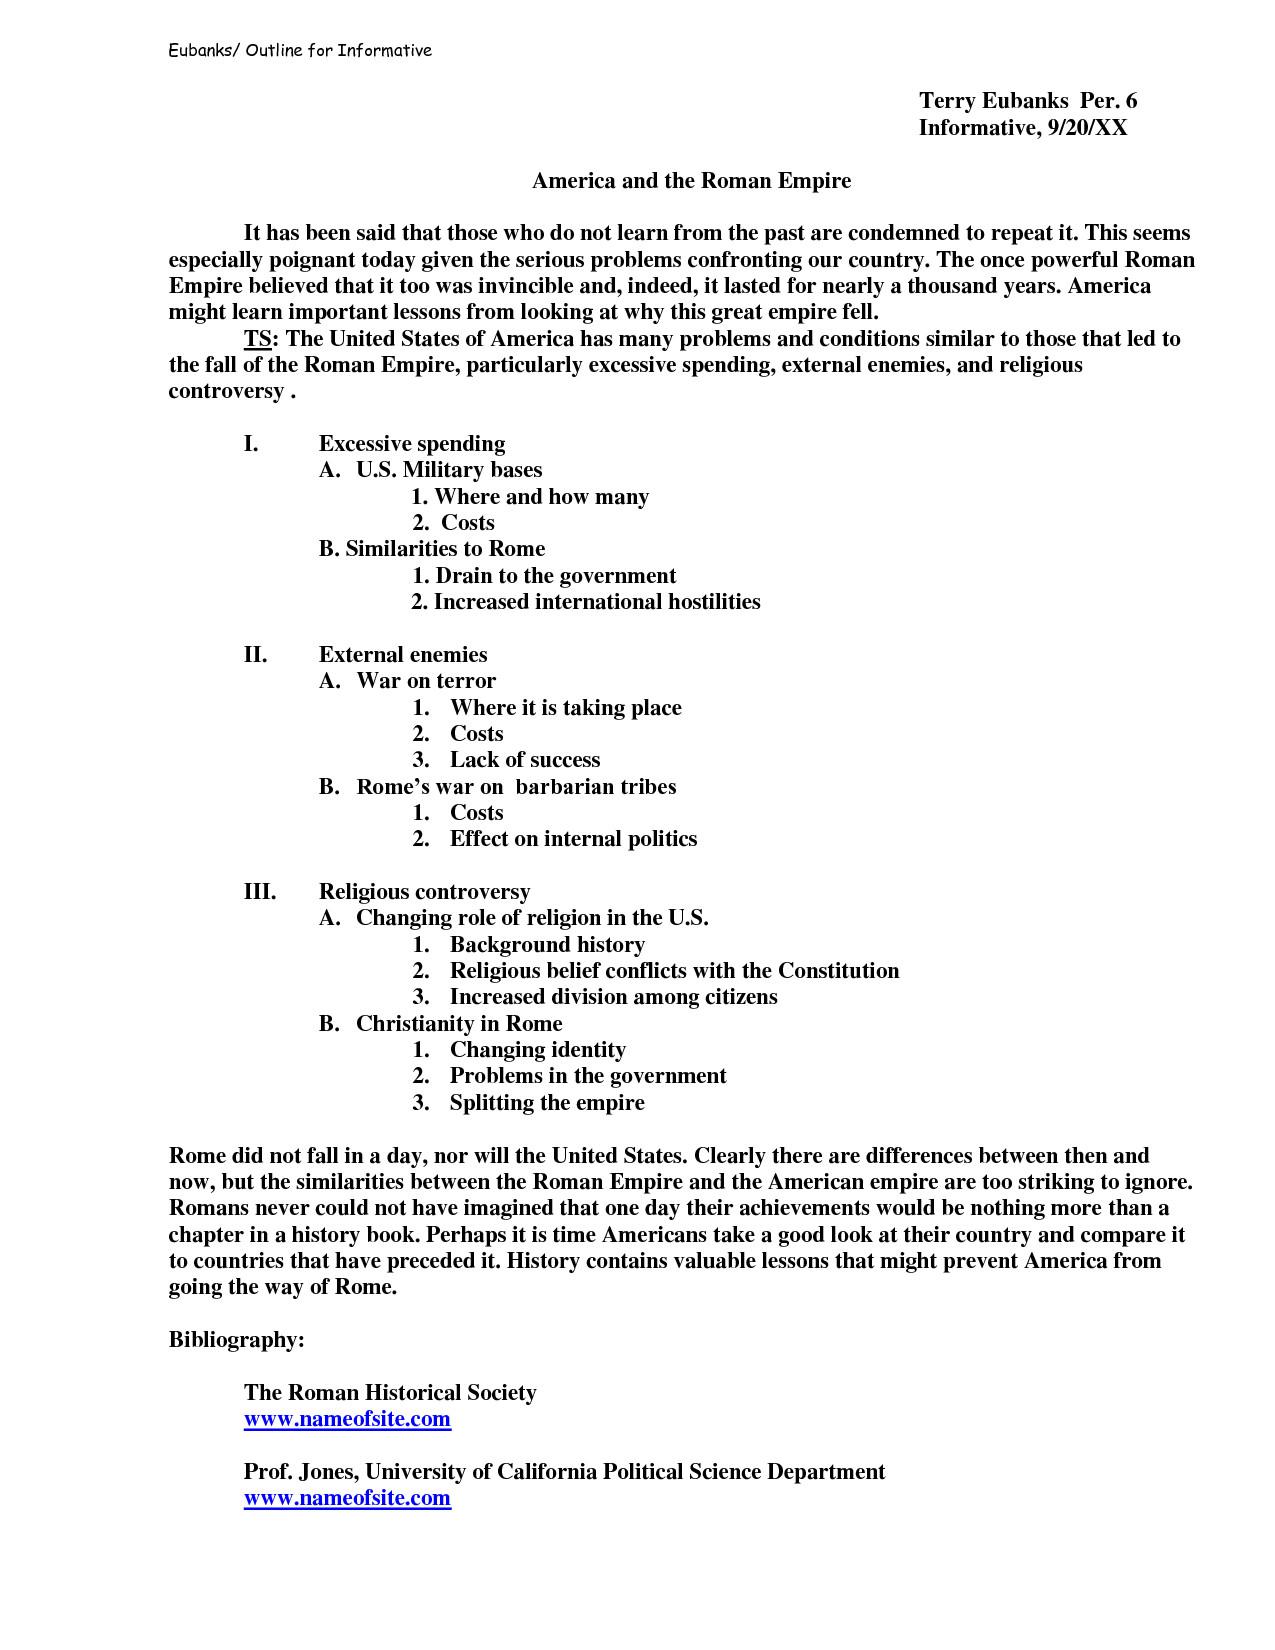 Informative Essay Outline Template Informative Speech Outline